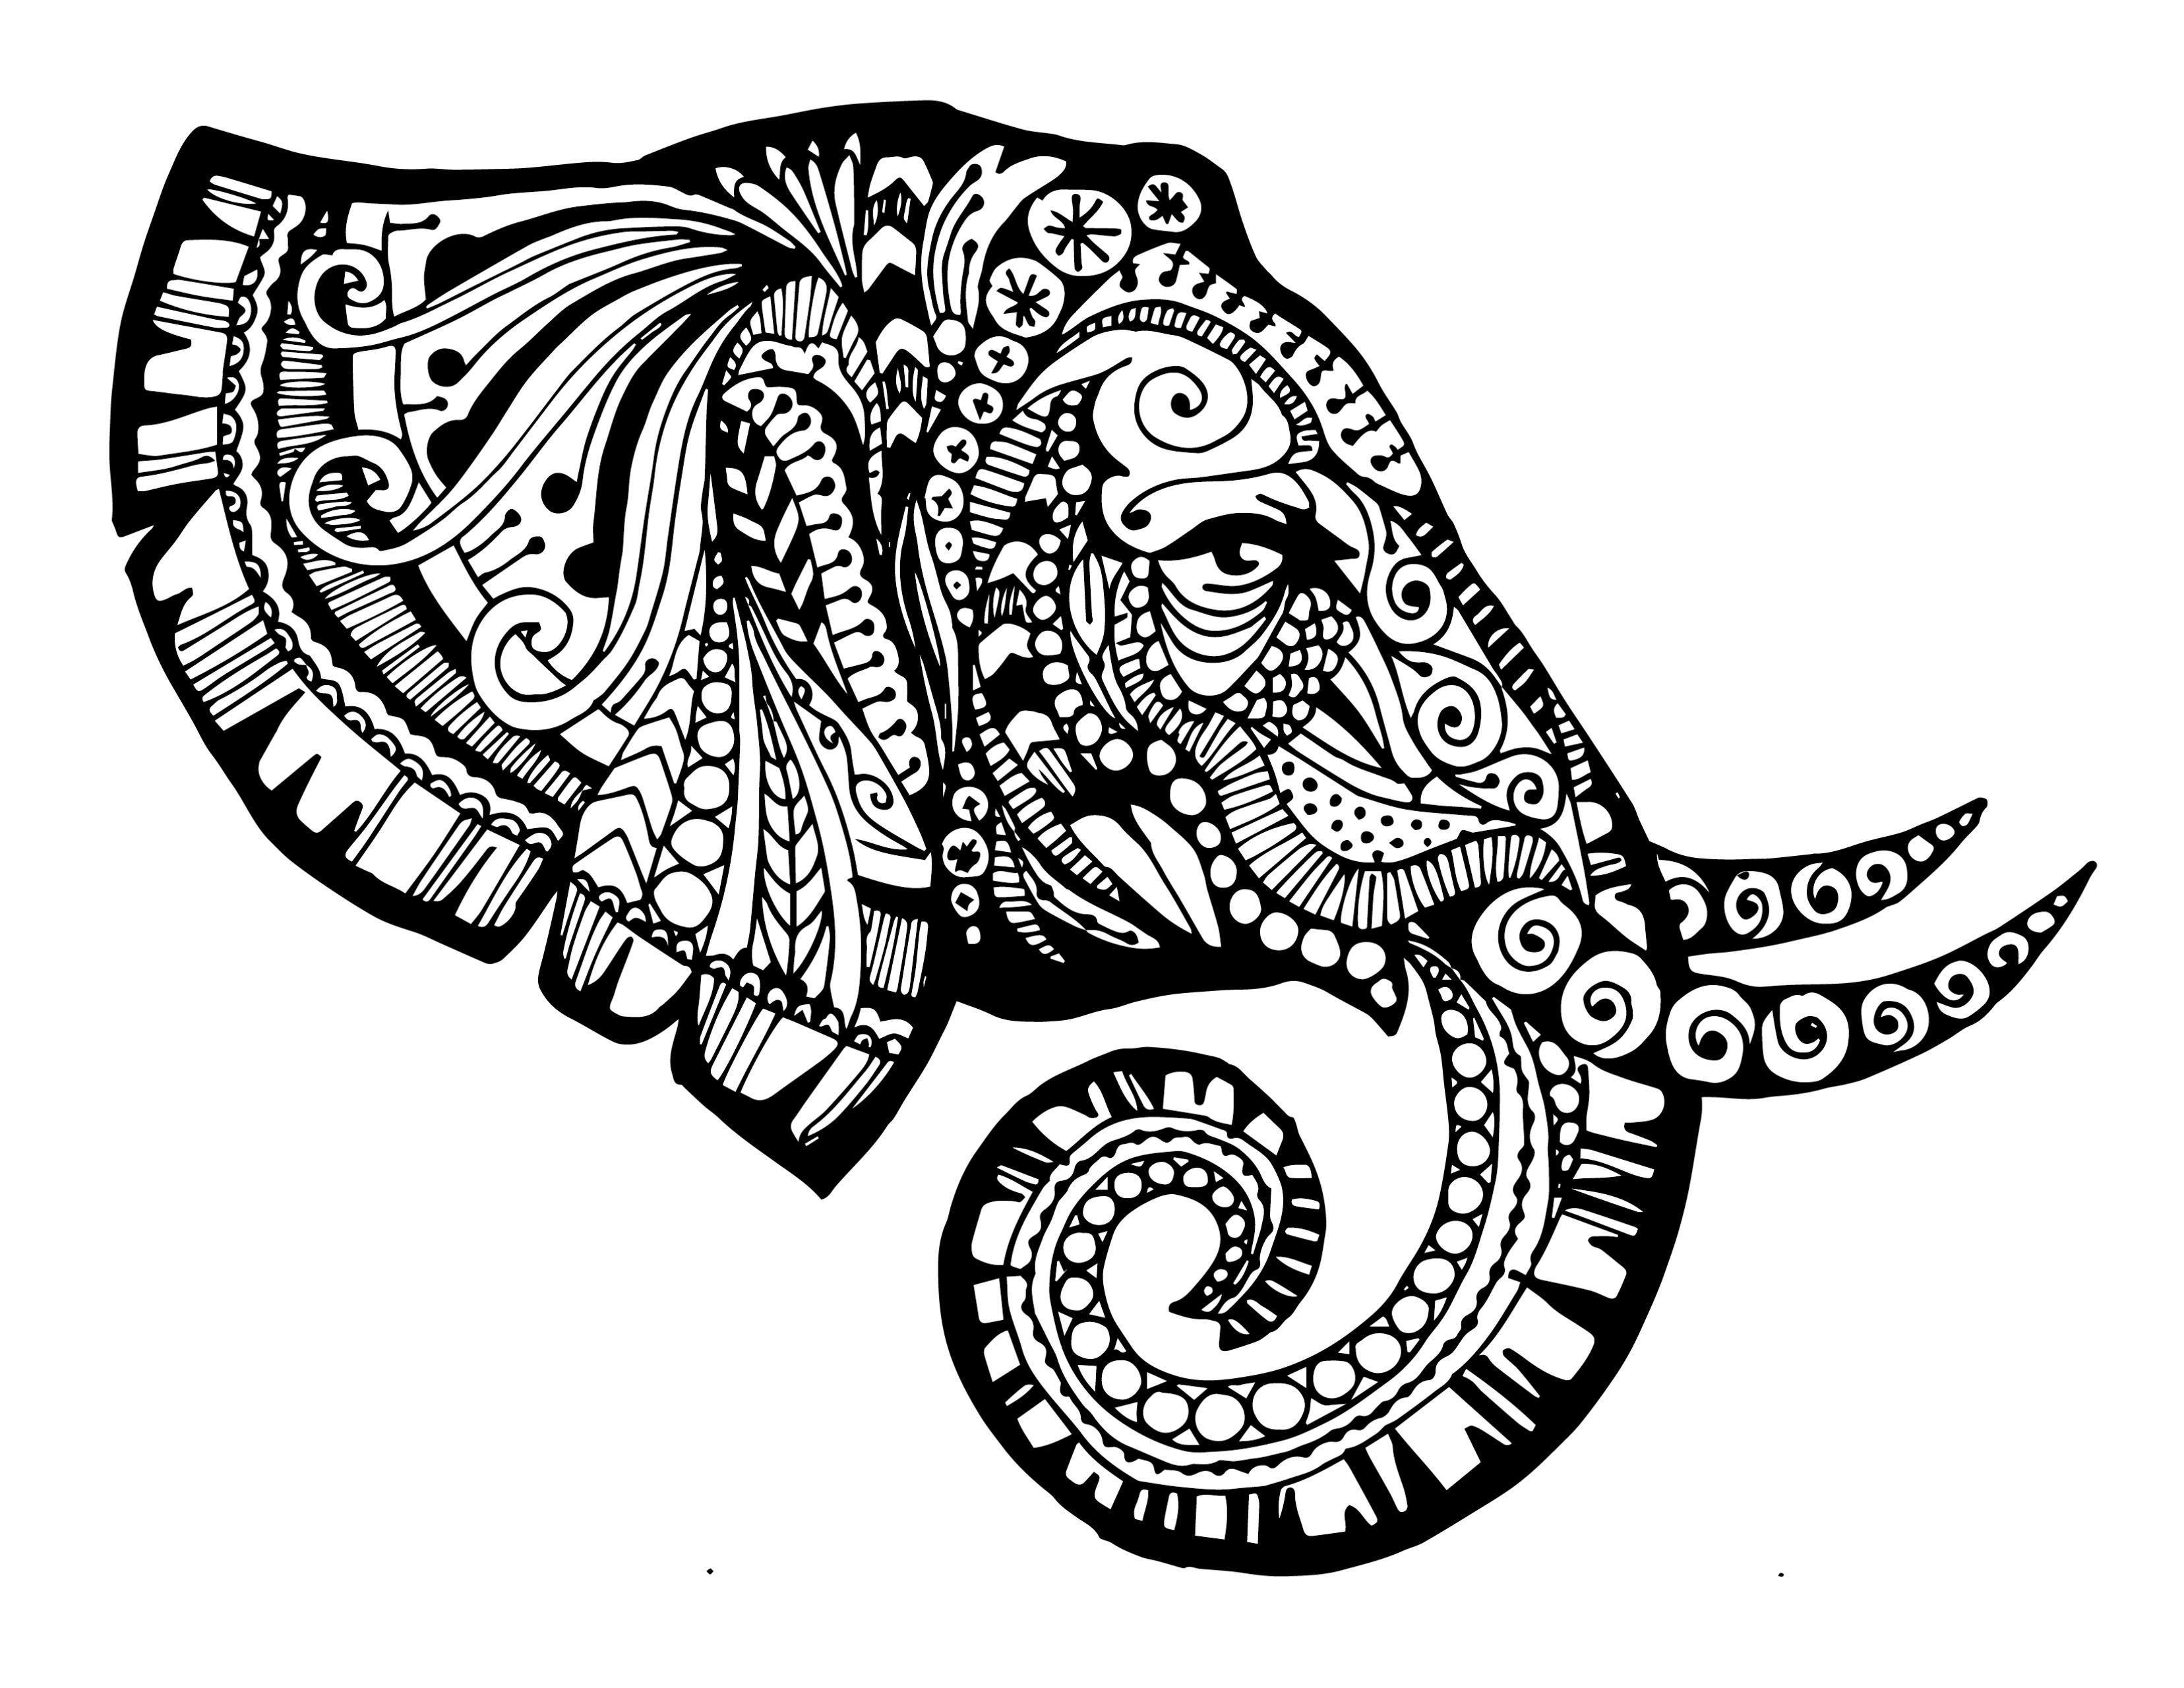 Zentangled Elephant Printable - The Creative Monster | Art ...